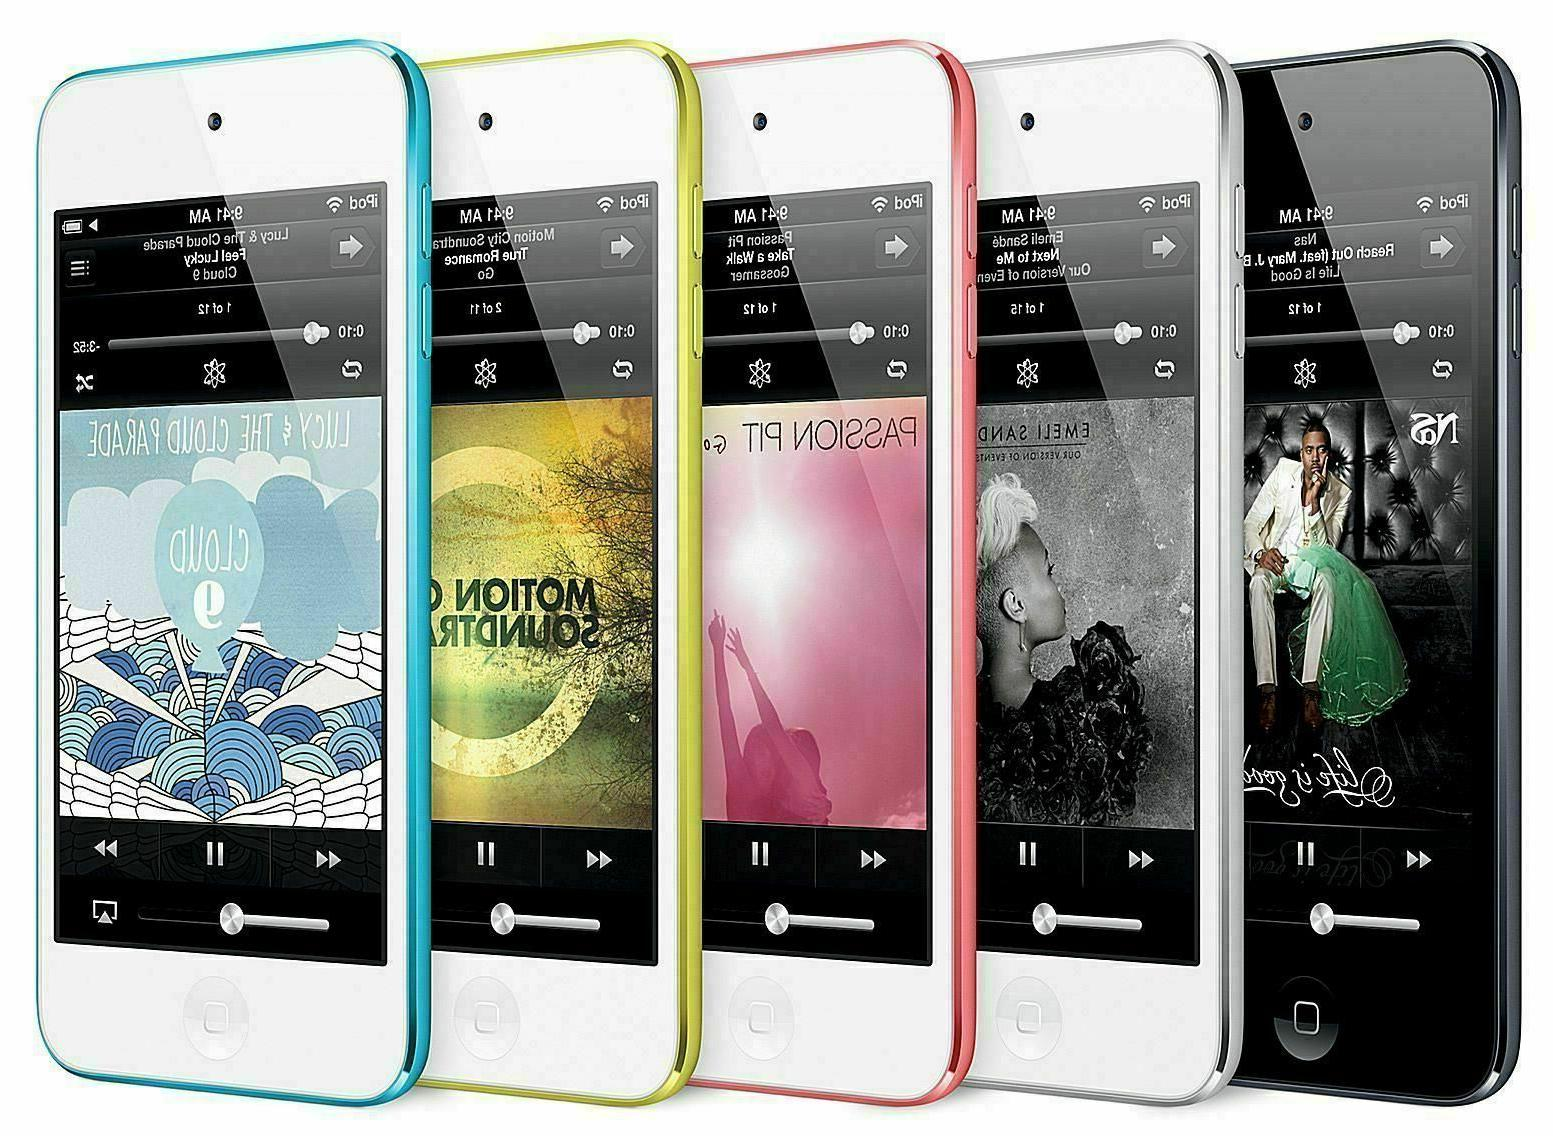 USA Brand Apple Generation 32GB MP4 Player